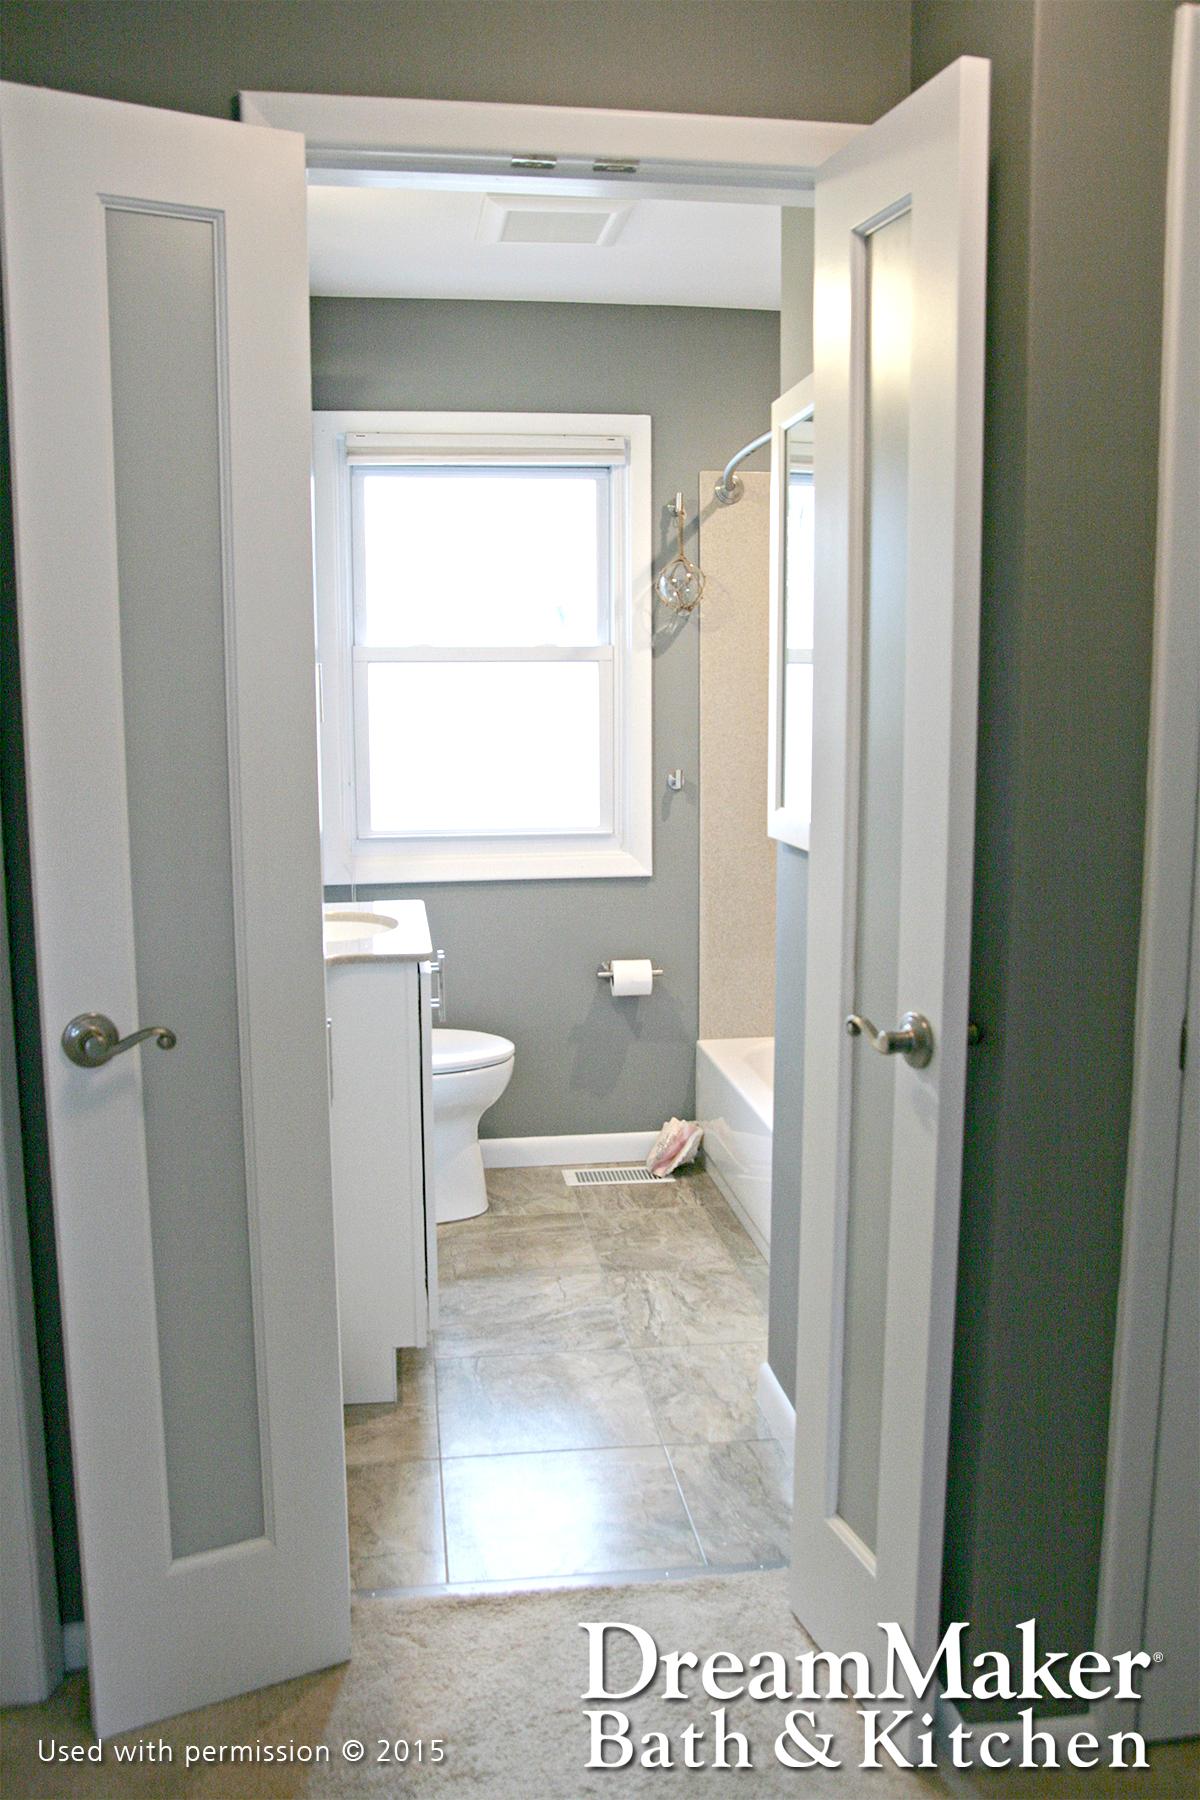 Standard Baths Amp Powder Rooms Gallery Dreammaker Bath